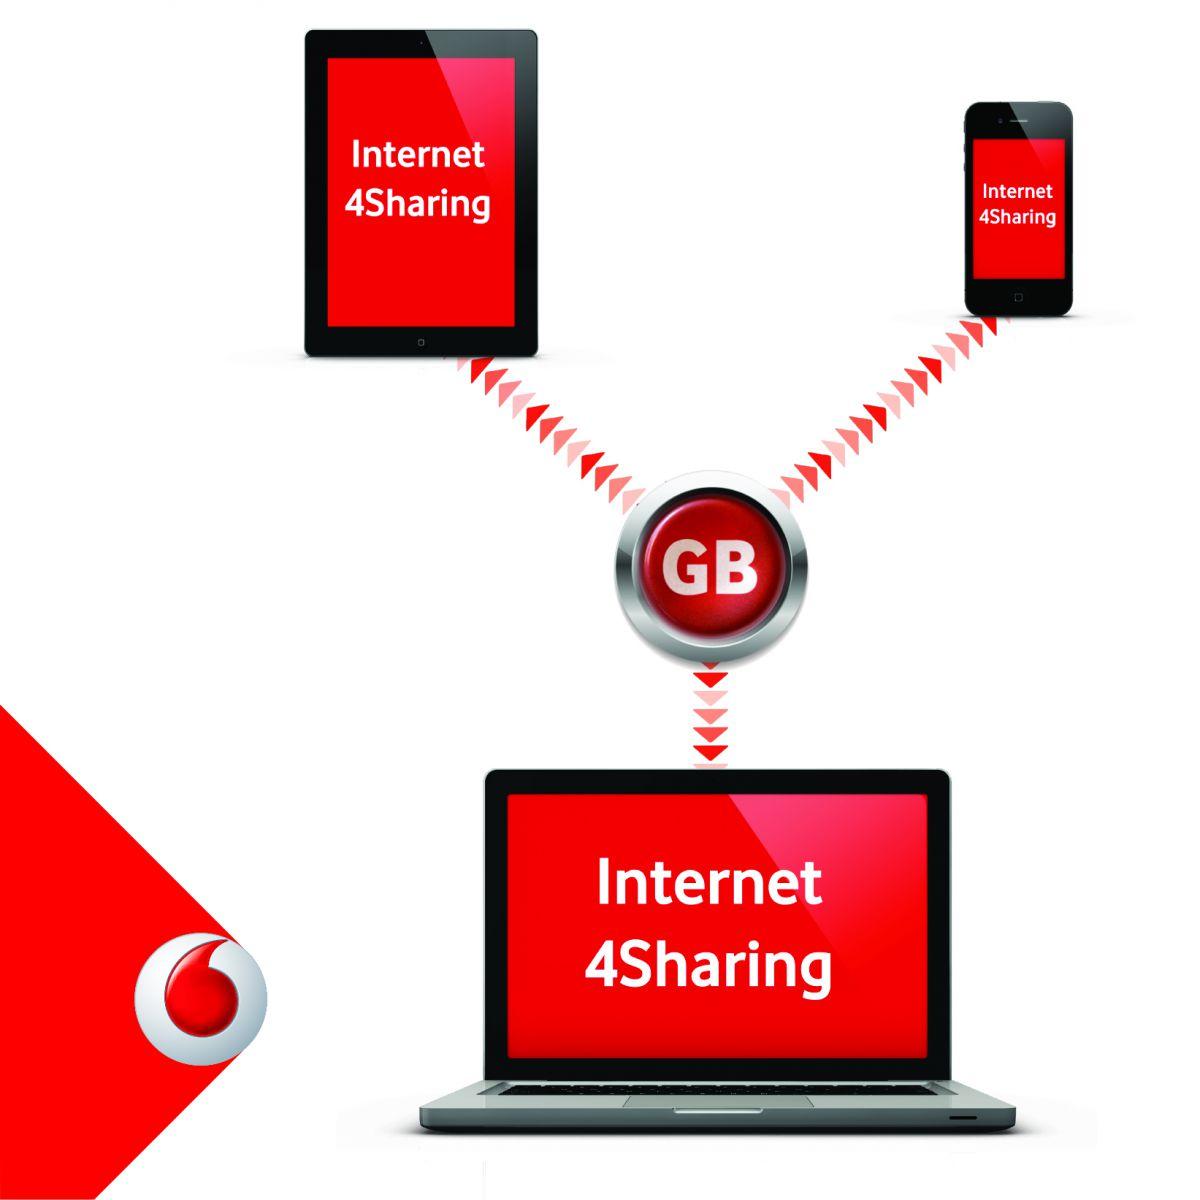 Vodafone_Internet_4Sharing_photo 2